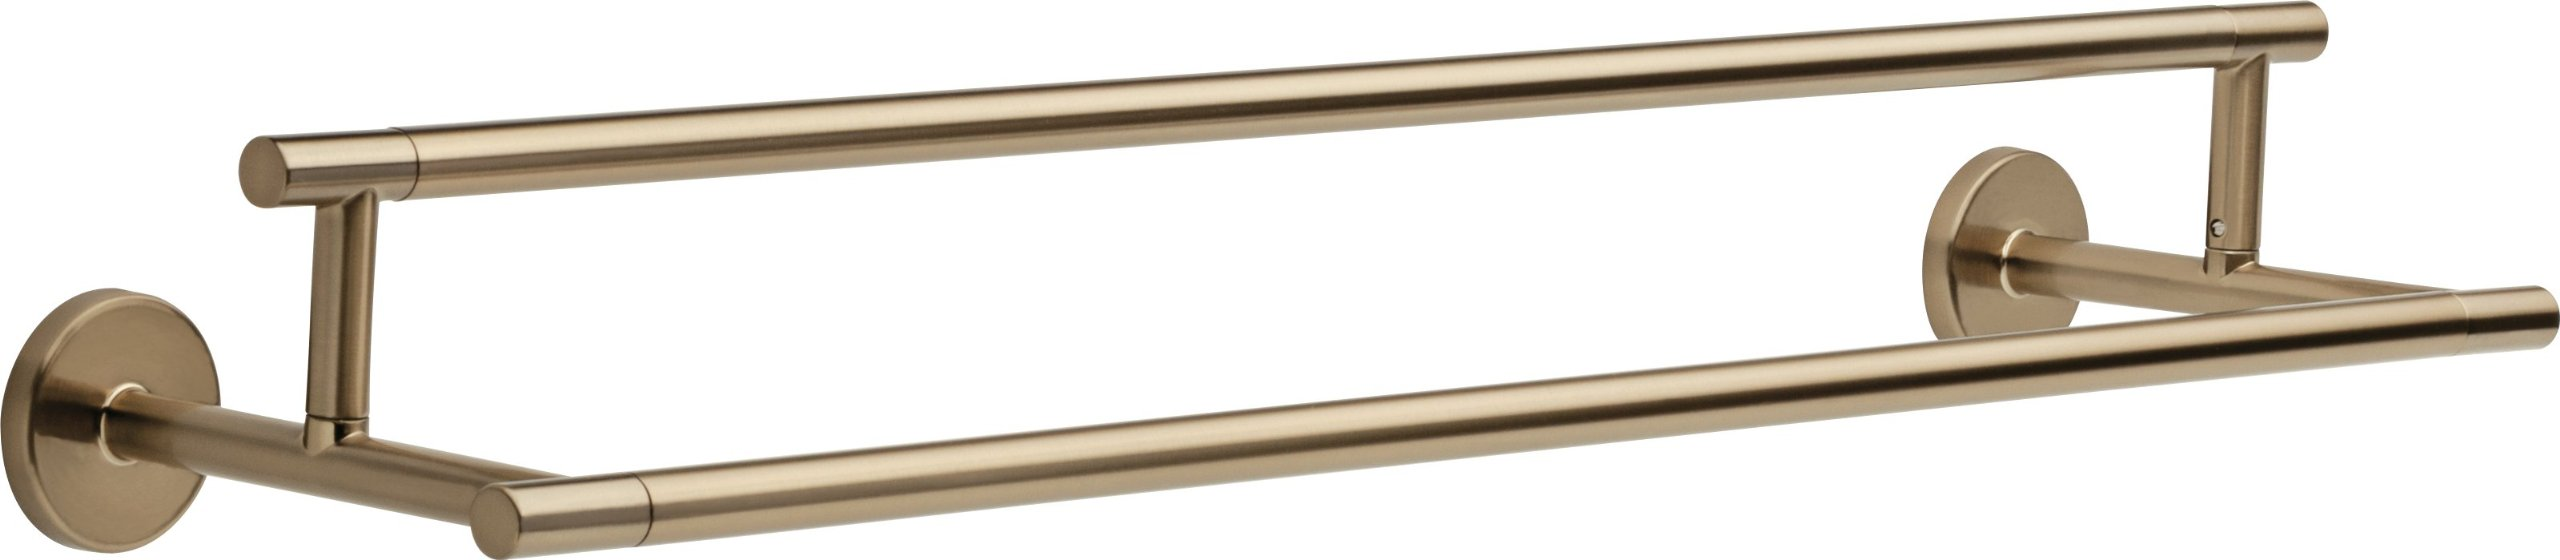 Delta Faucet 75925-CZ Trinsic 24inch Double Towel Bar Rack, Champagne Bronze